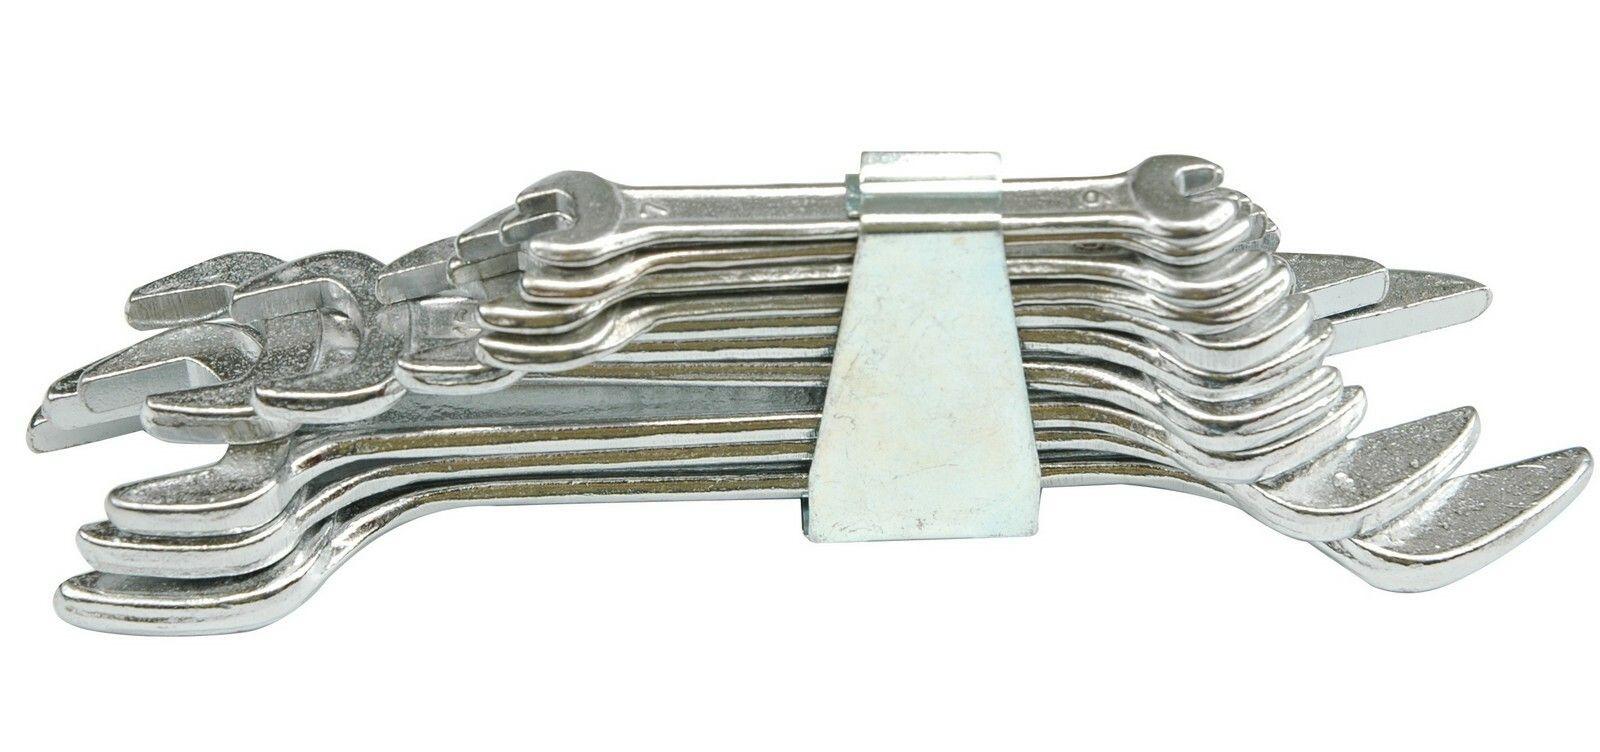 Sada klíčů plochých 10 ks 6 - 32 mm spona TOYA